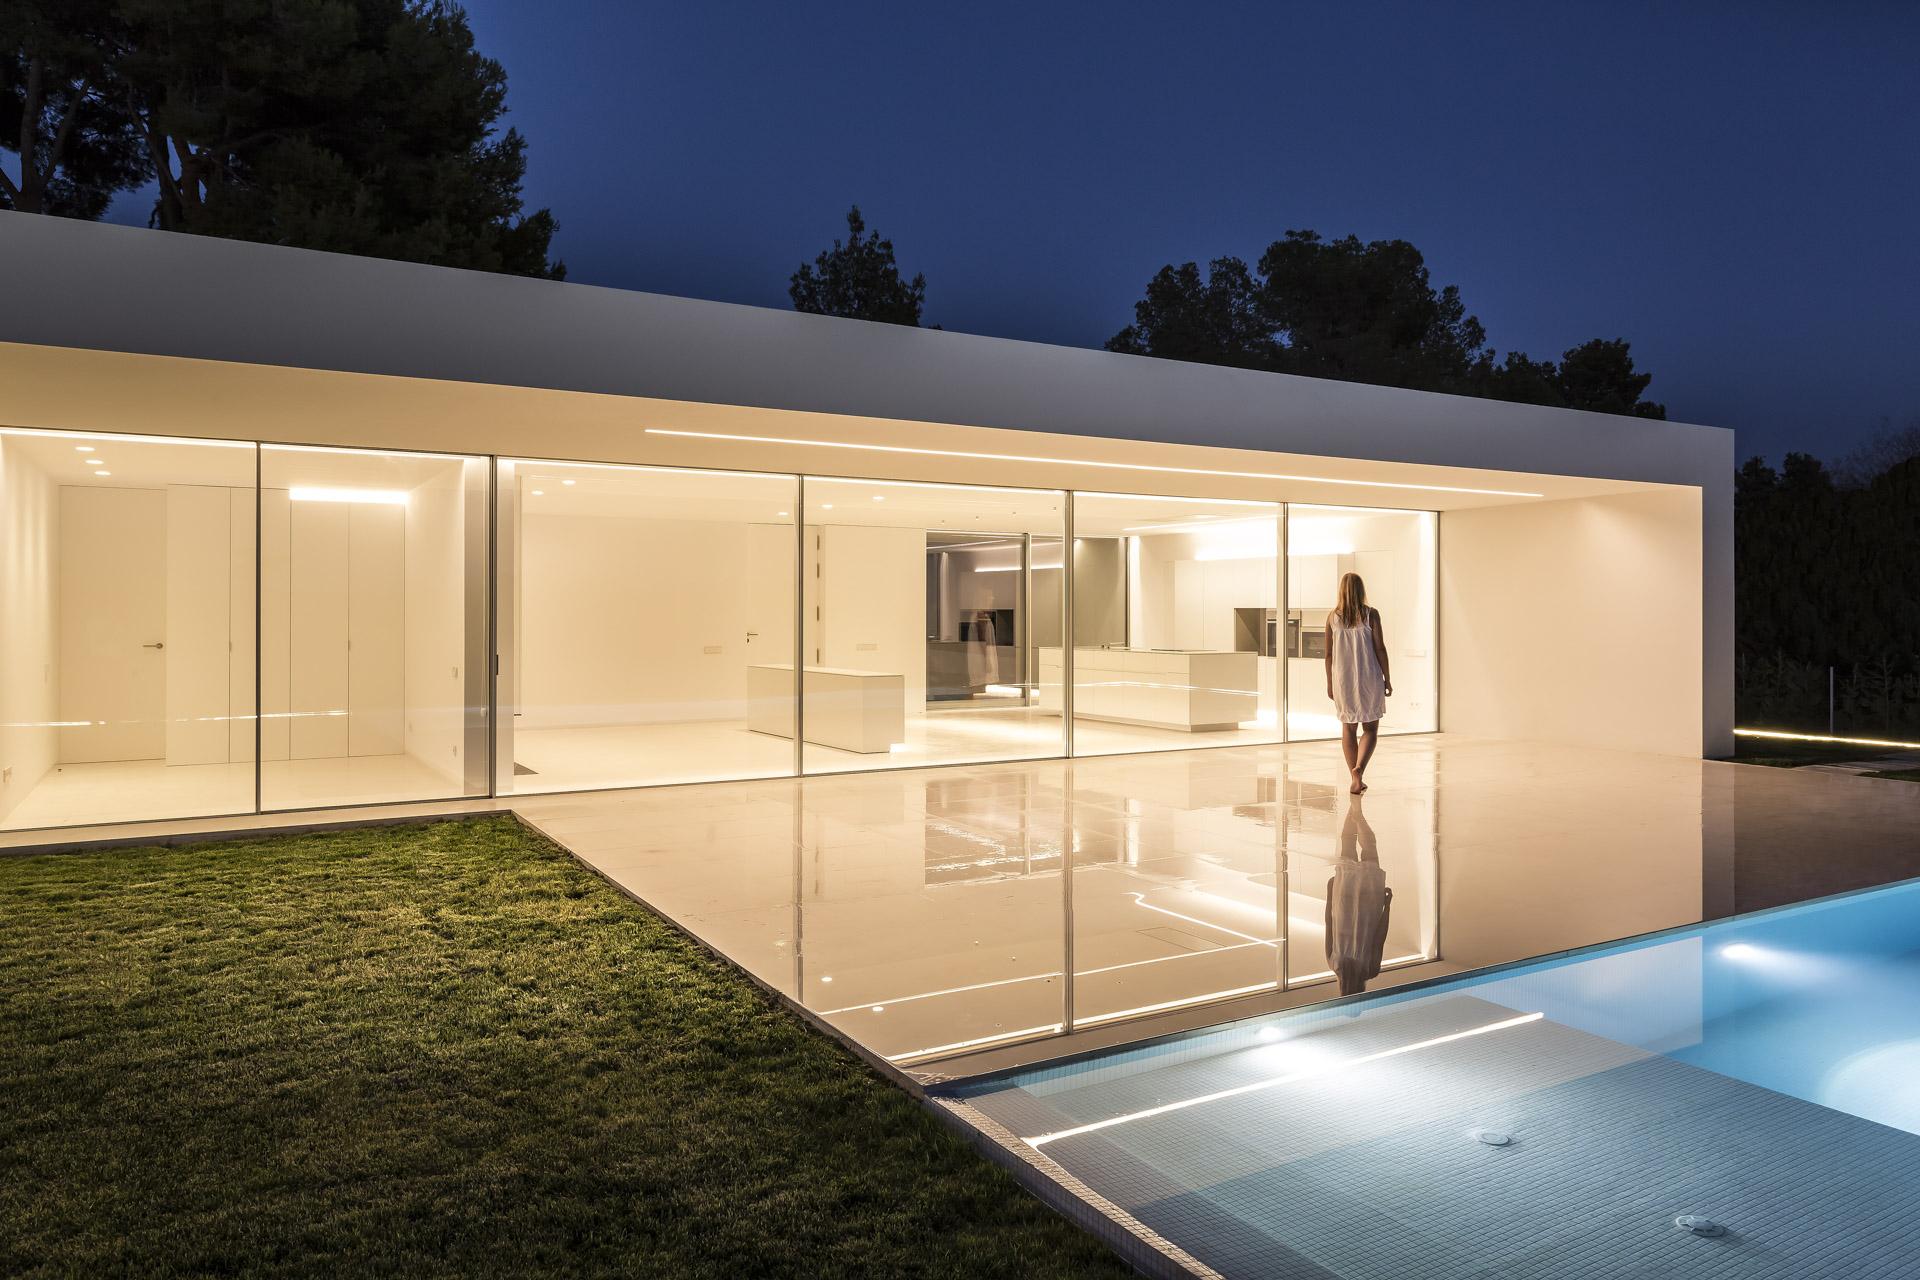 fotografia-arquitectura-valencia-german-cabo-gallardo-llopis-villamarchante-vivienda-62